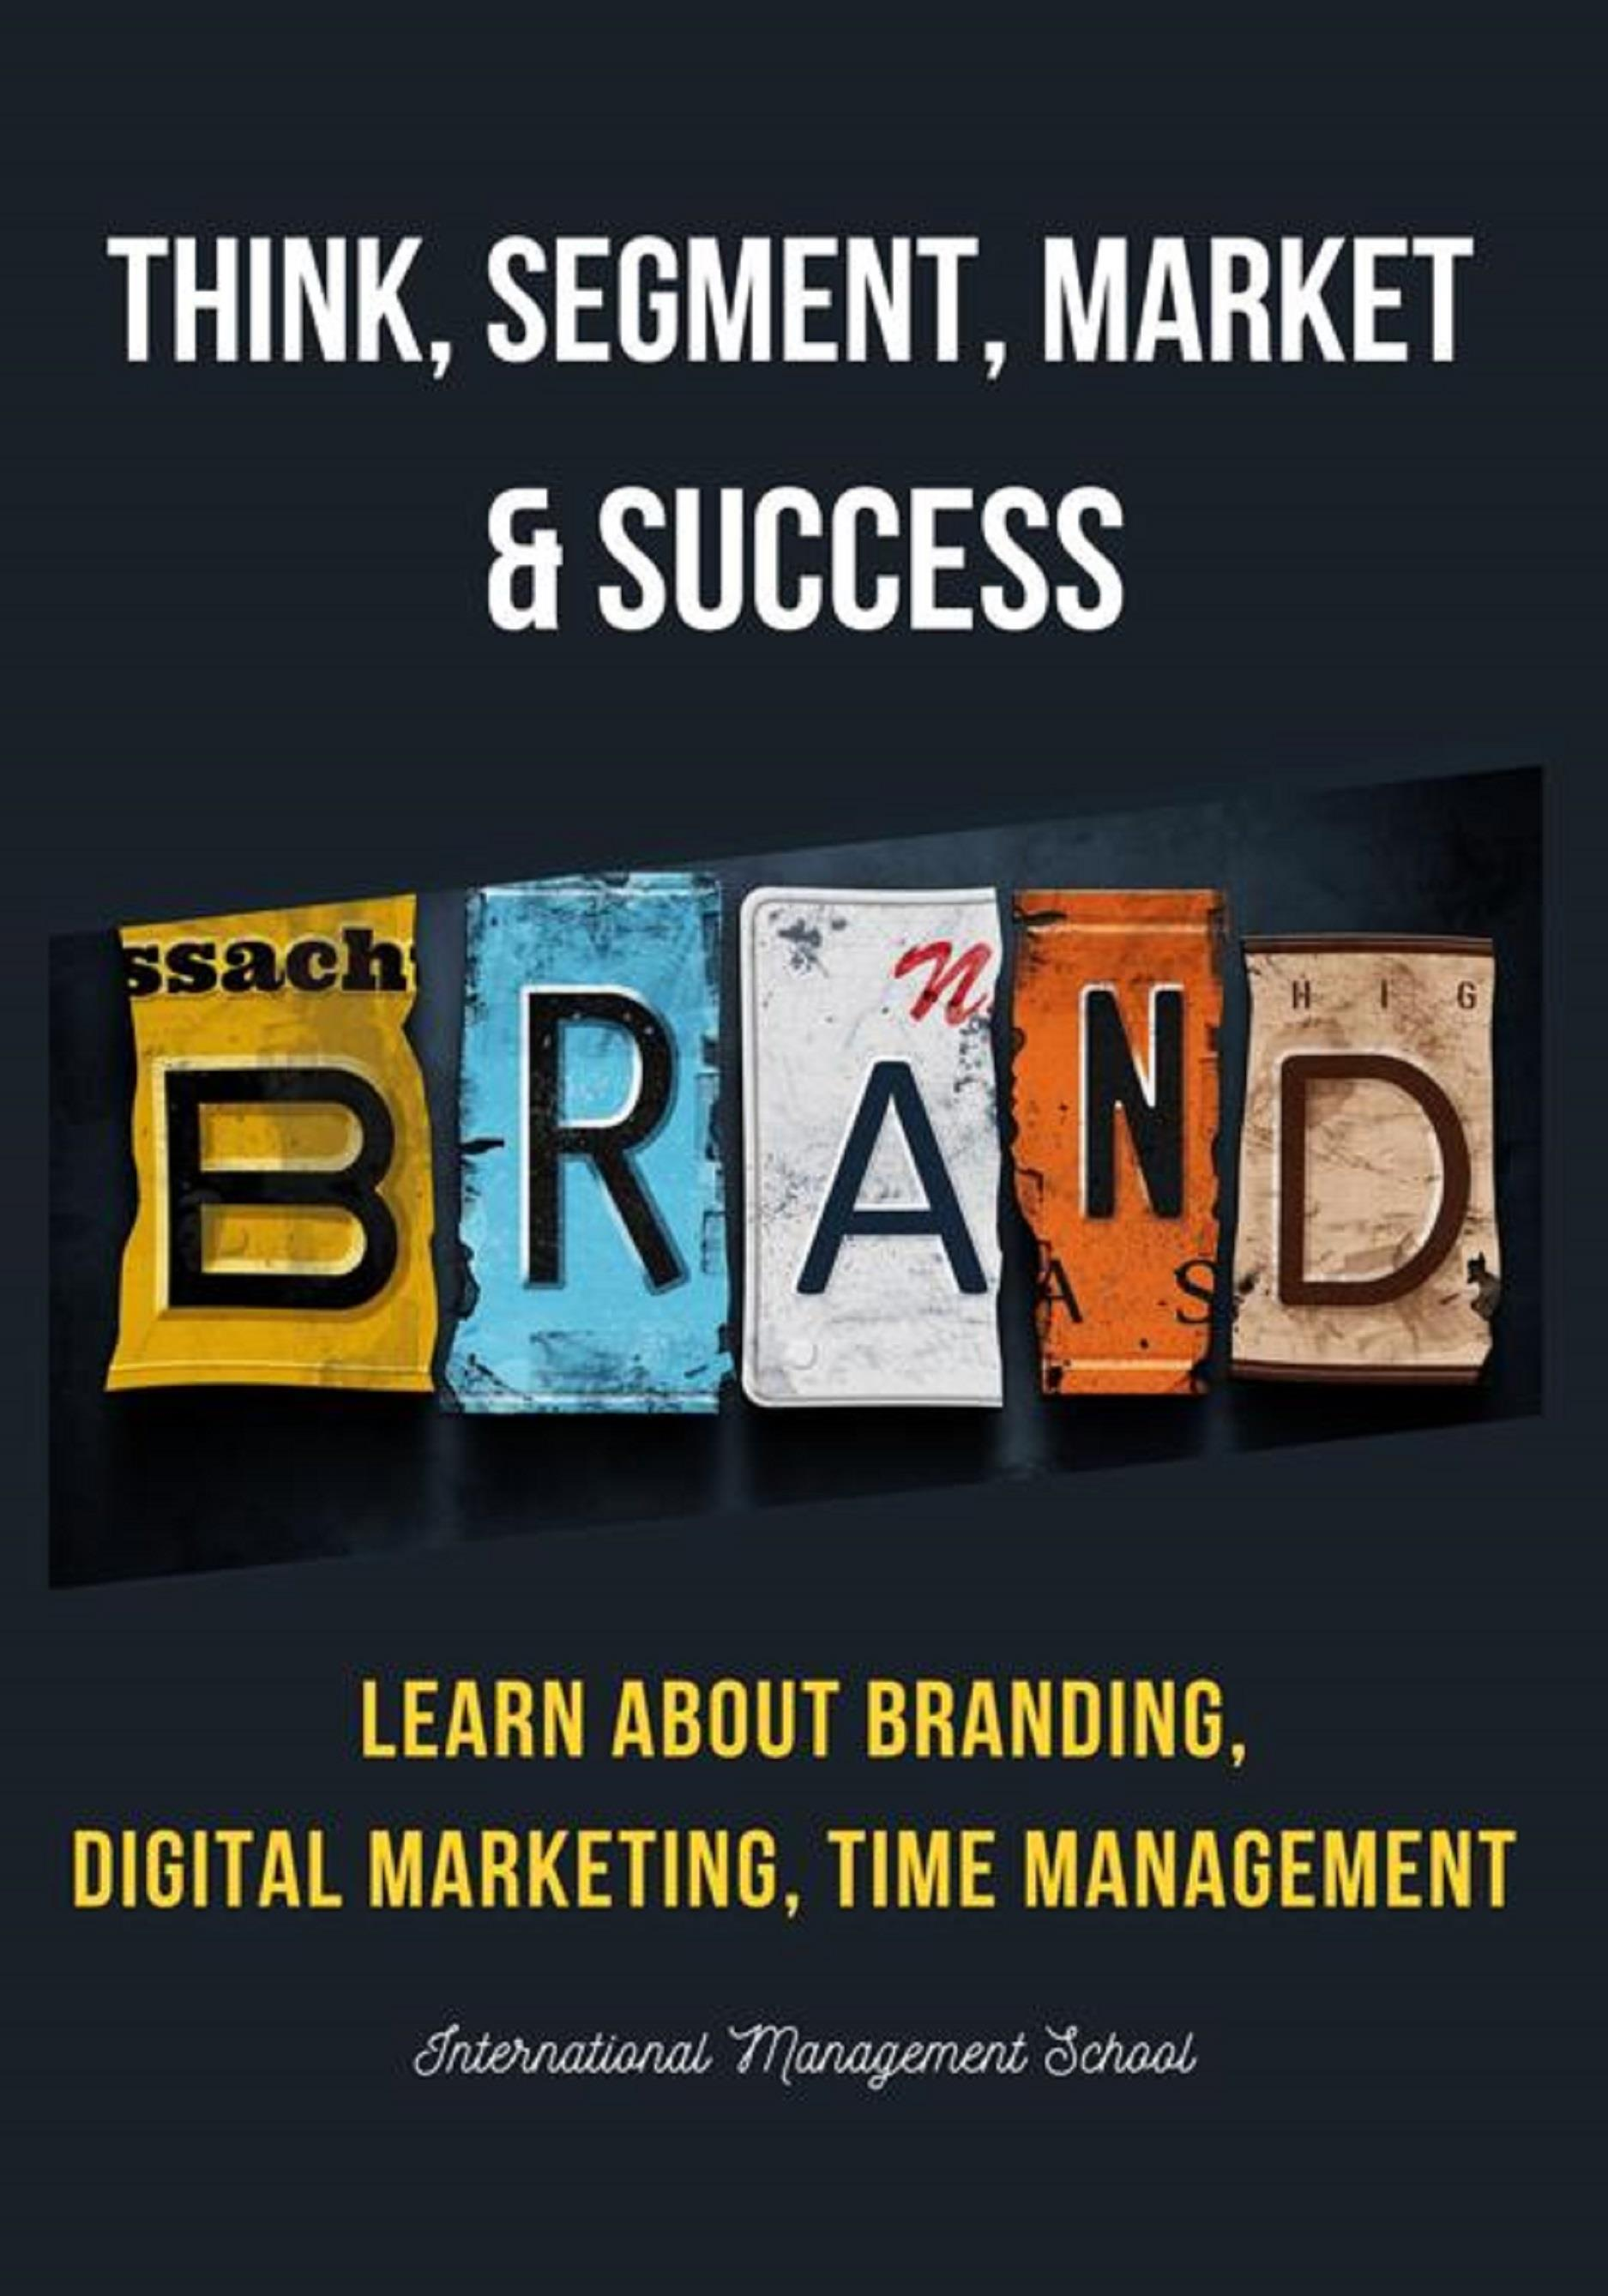 Think, Segment, Brand, Market and Success